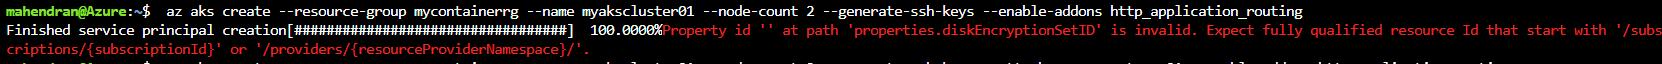 Running Container Workloads in Microsoft Azure 17